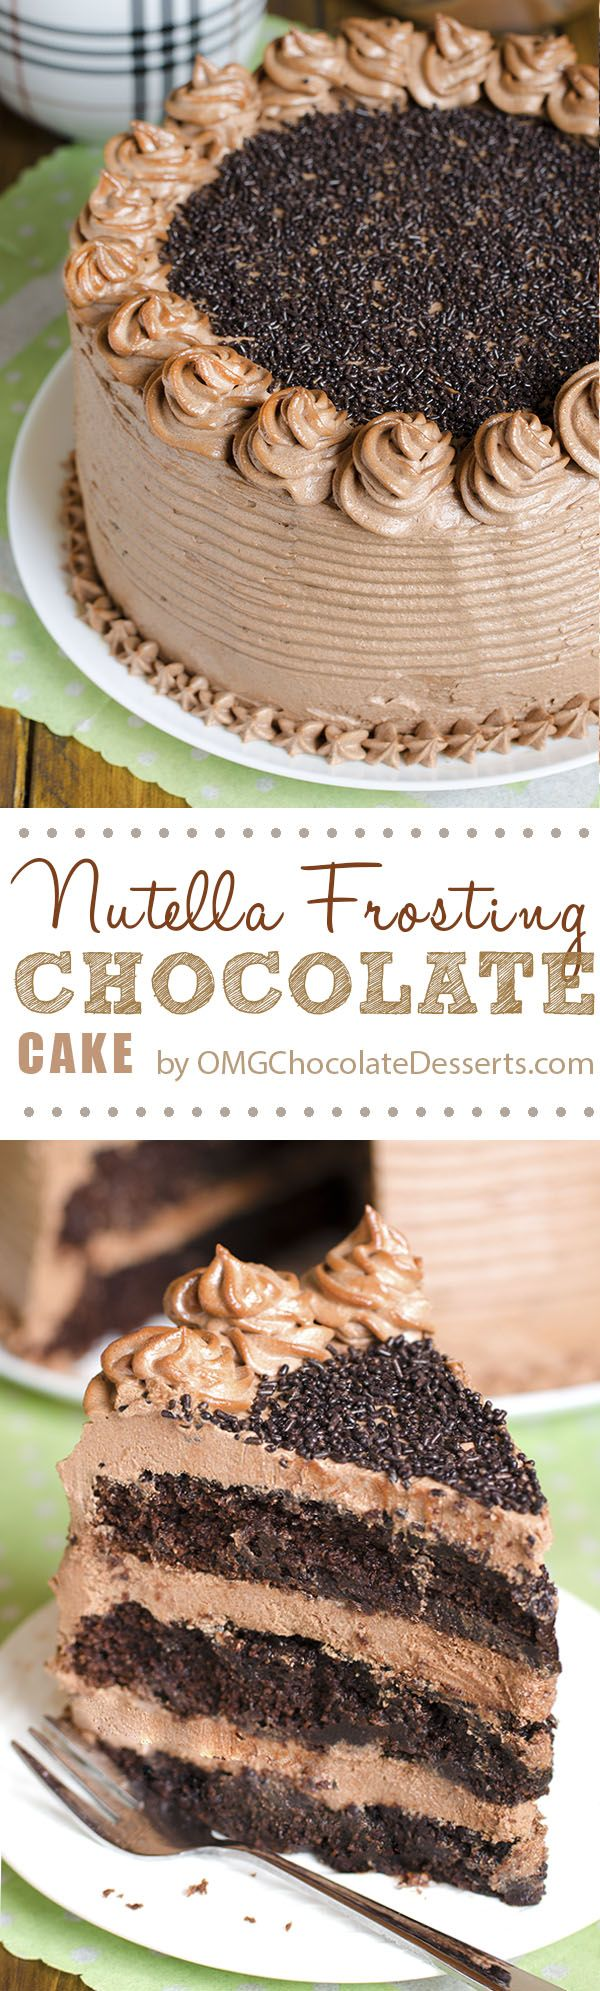 Decadent Nutella Chocolate Cake | OMGChocolateDesserts.com | #Nutella #chocolate #cake